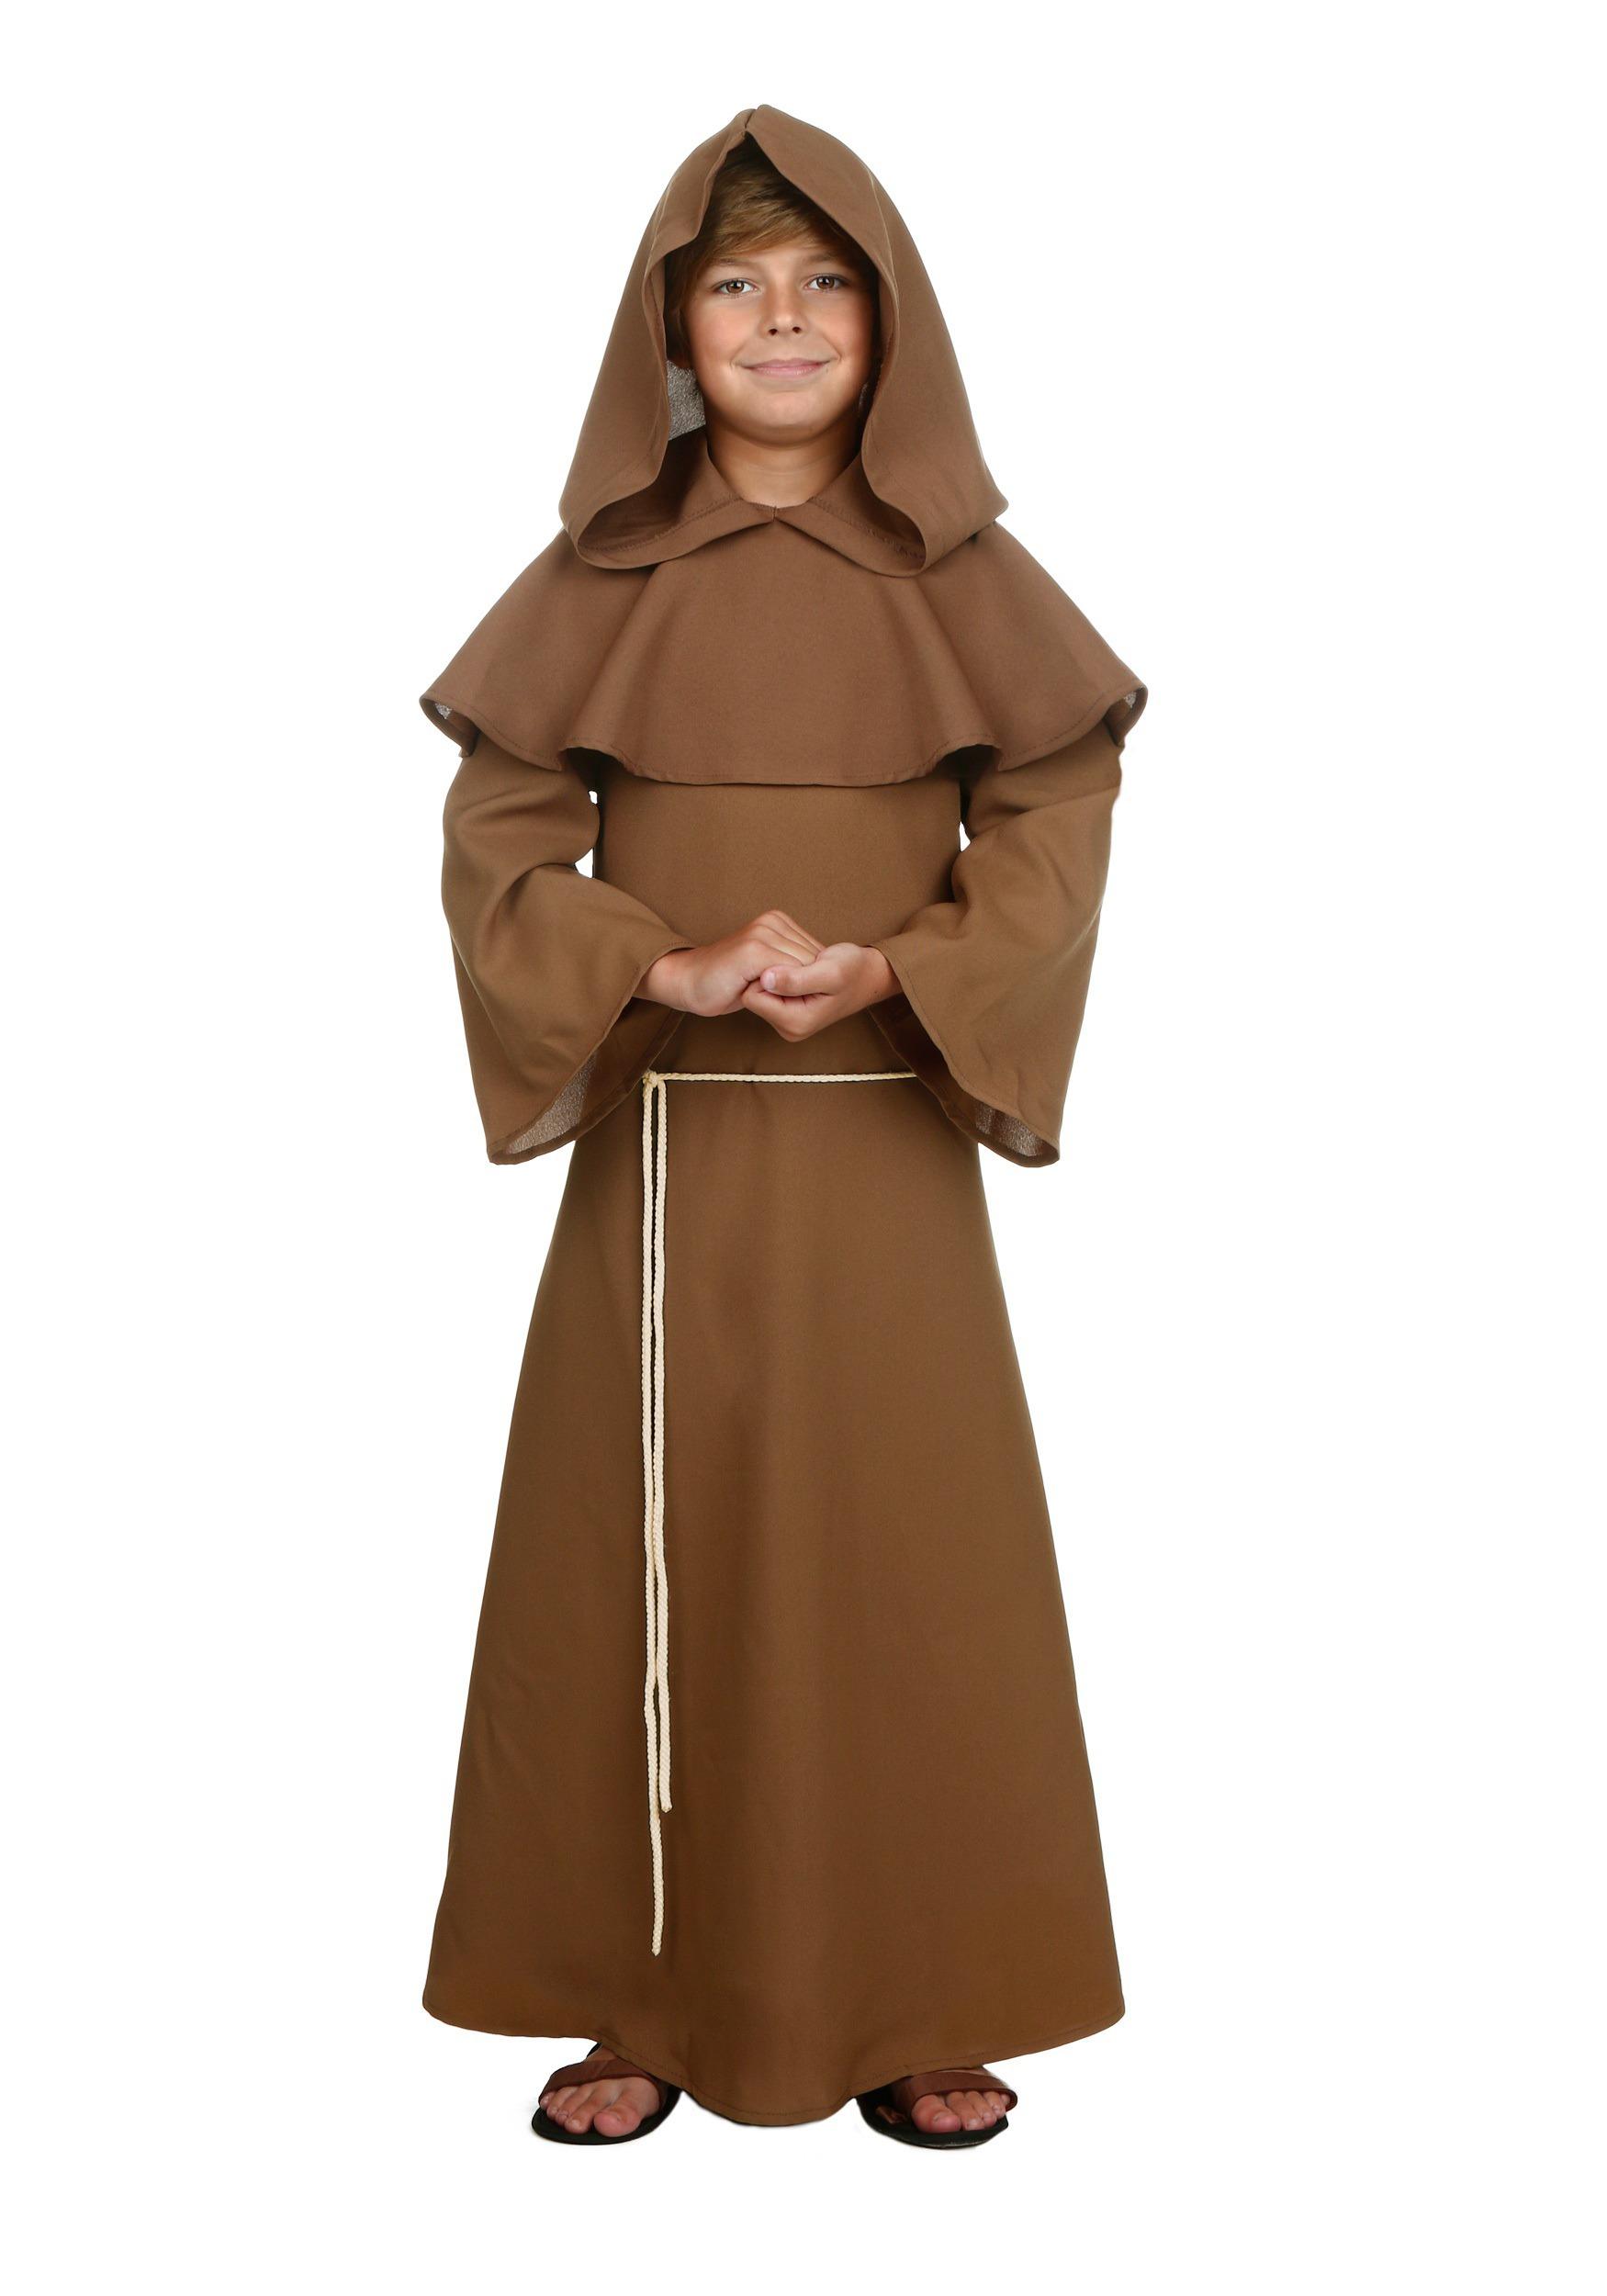 Monk Costumes